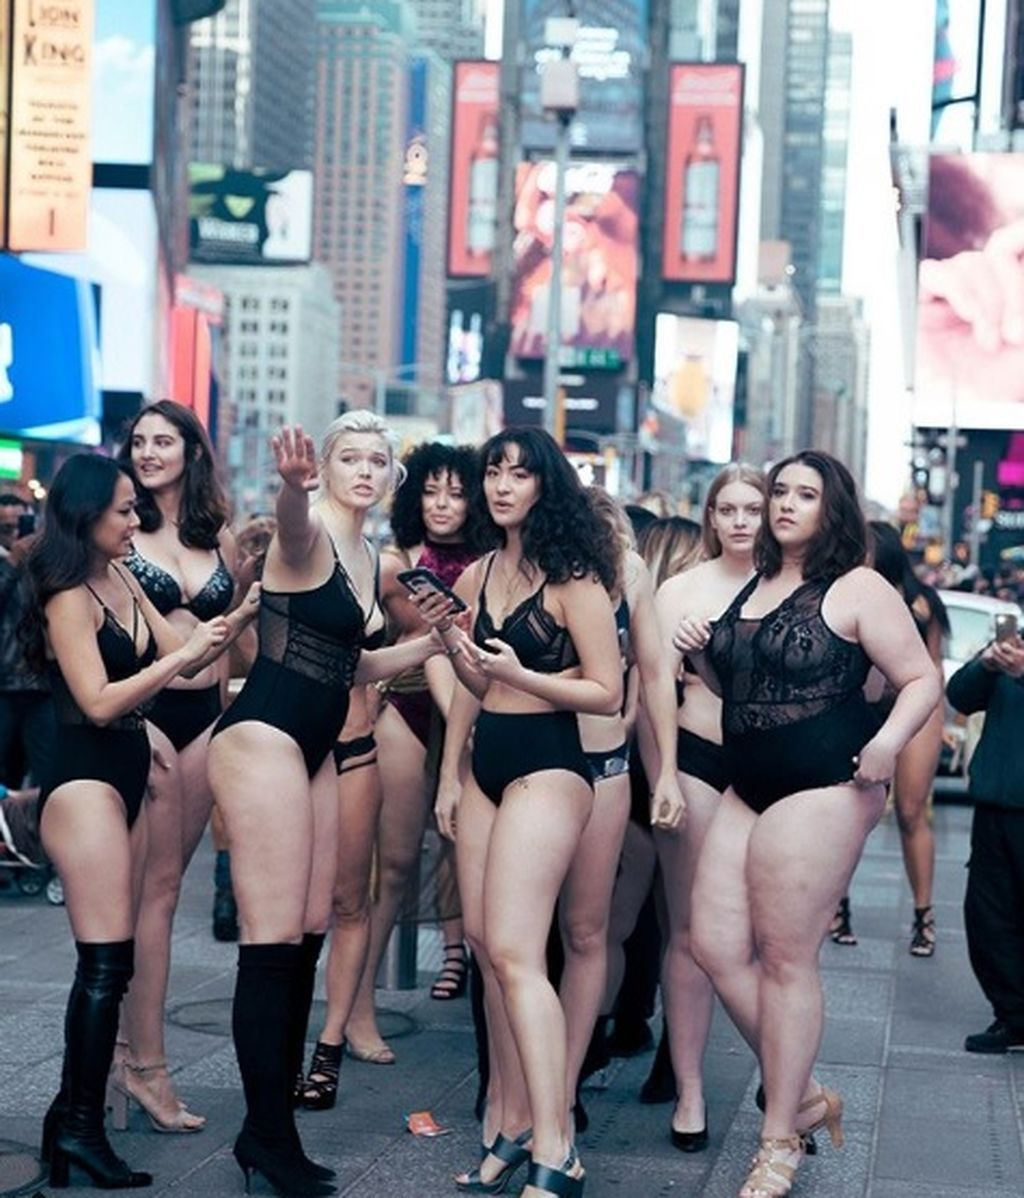 Modelos de talla grande en lencería paralizan Times Square para reivindicar su belleza